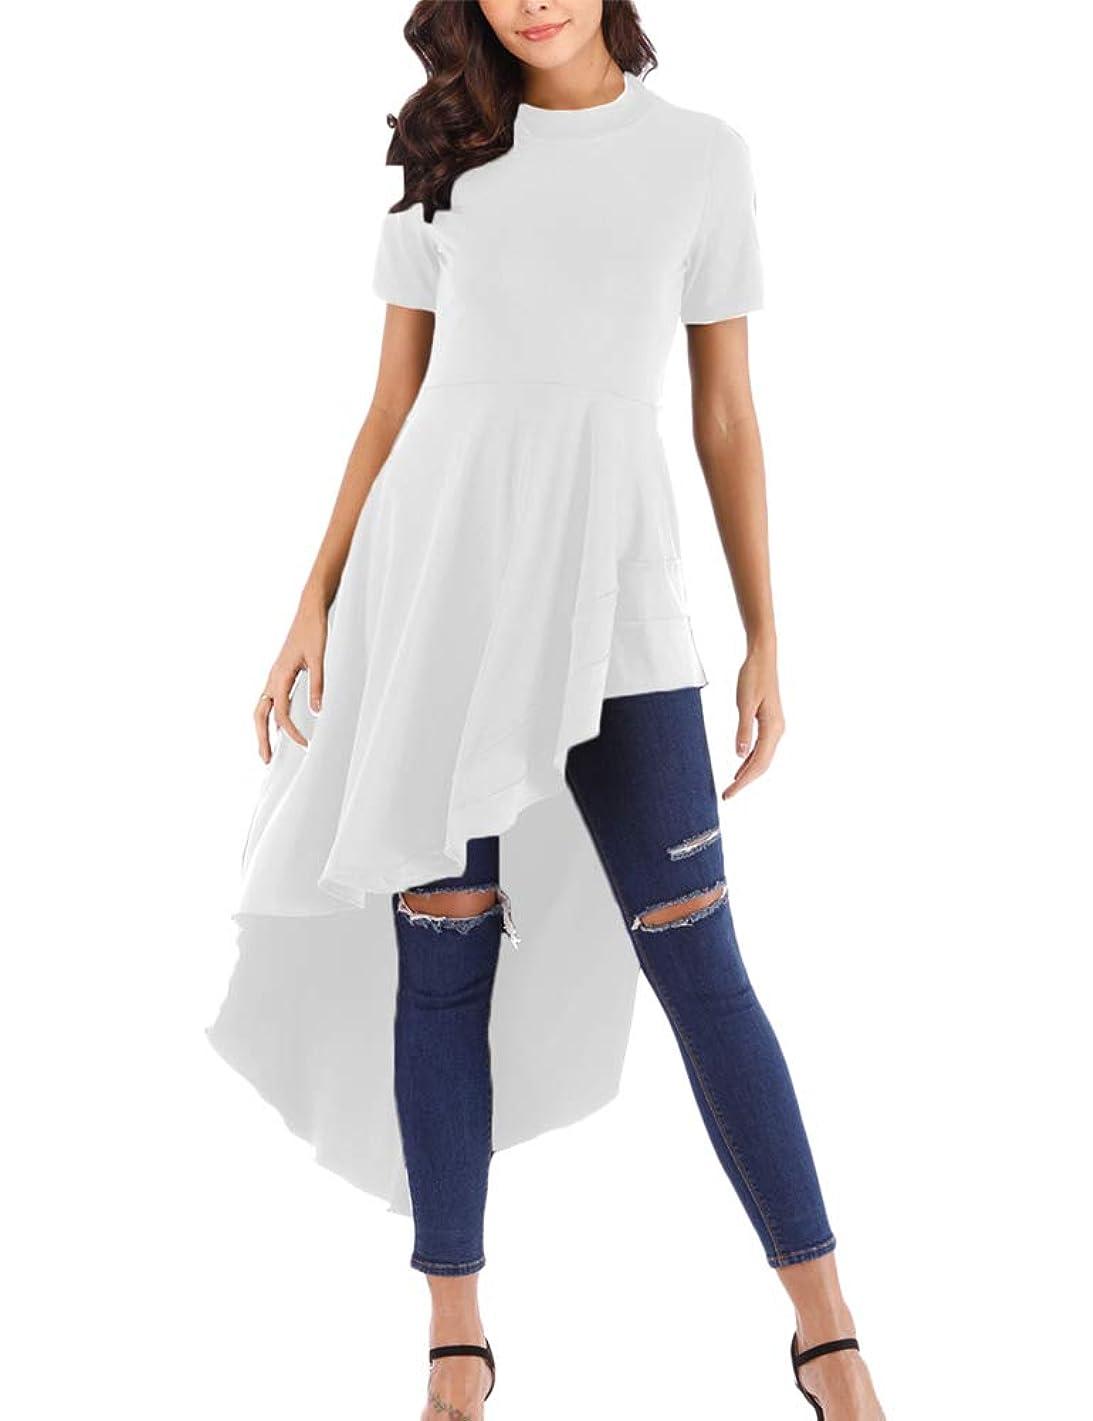 Women's Ruffle High Low Asymmetrical Irregular Hem Tops Short Sleeve Tunic Top